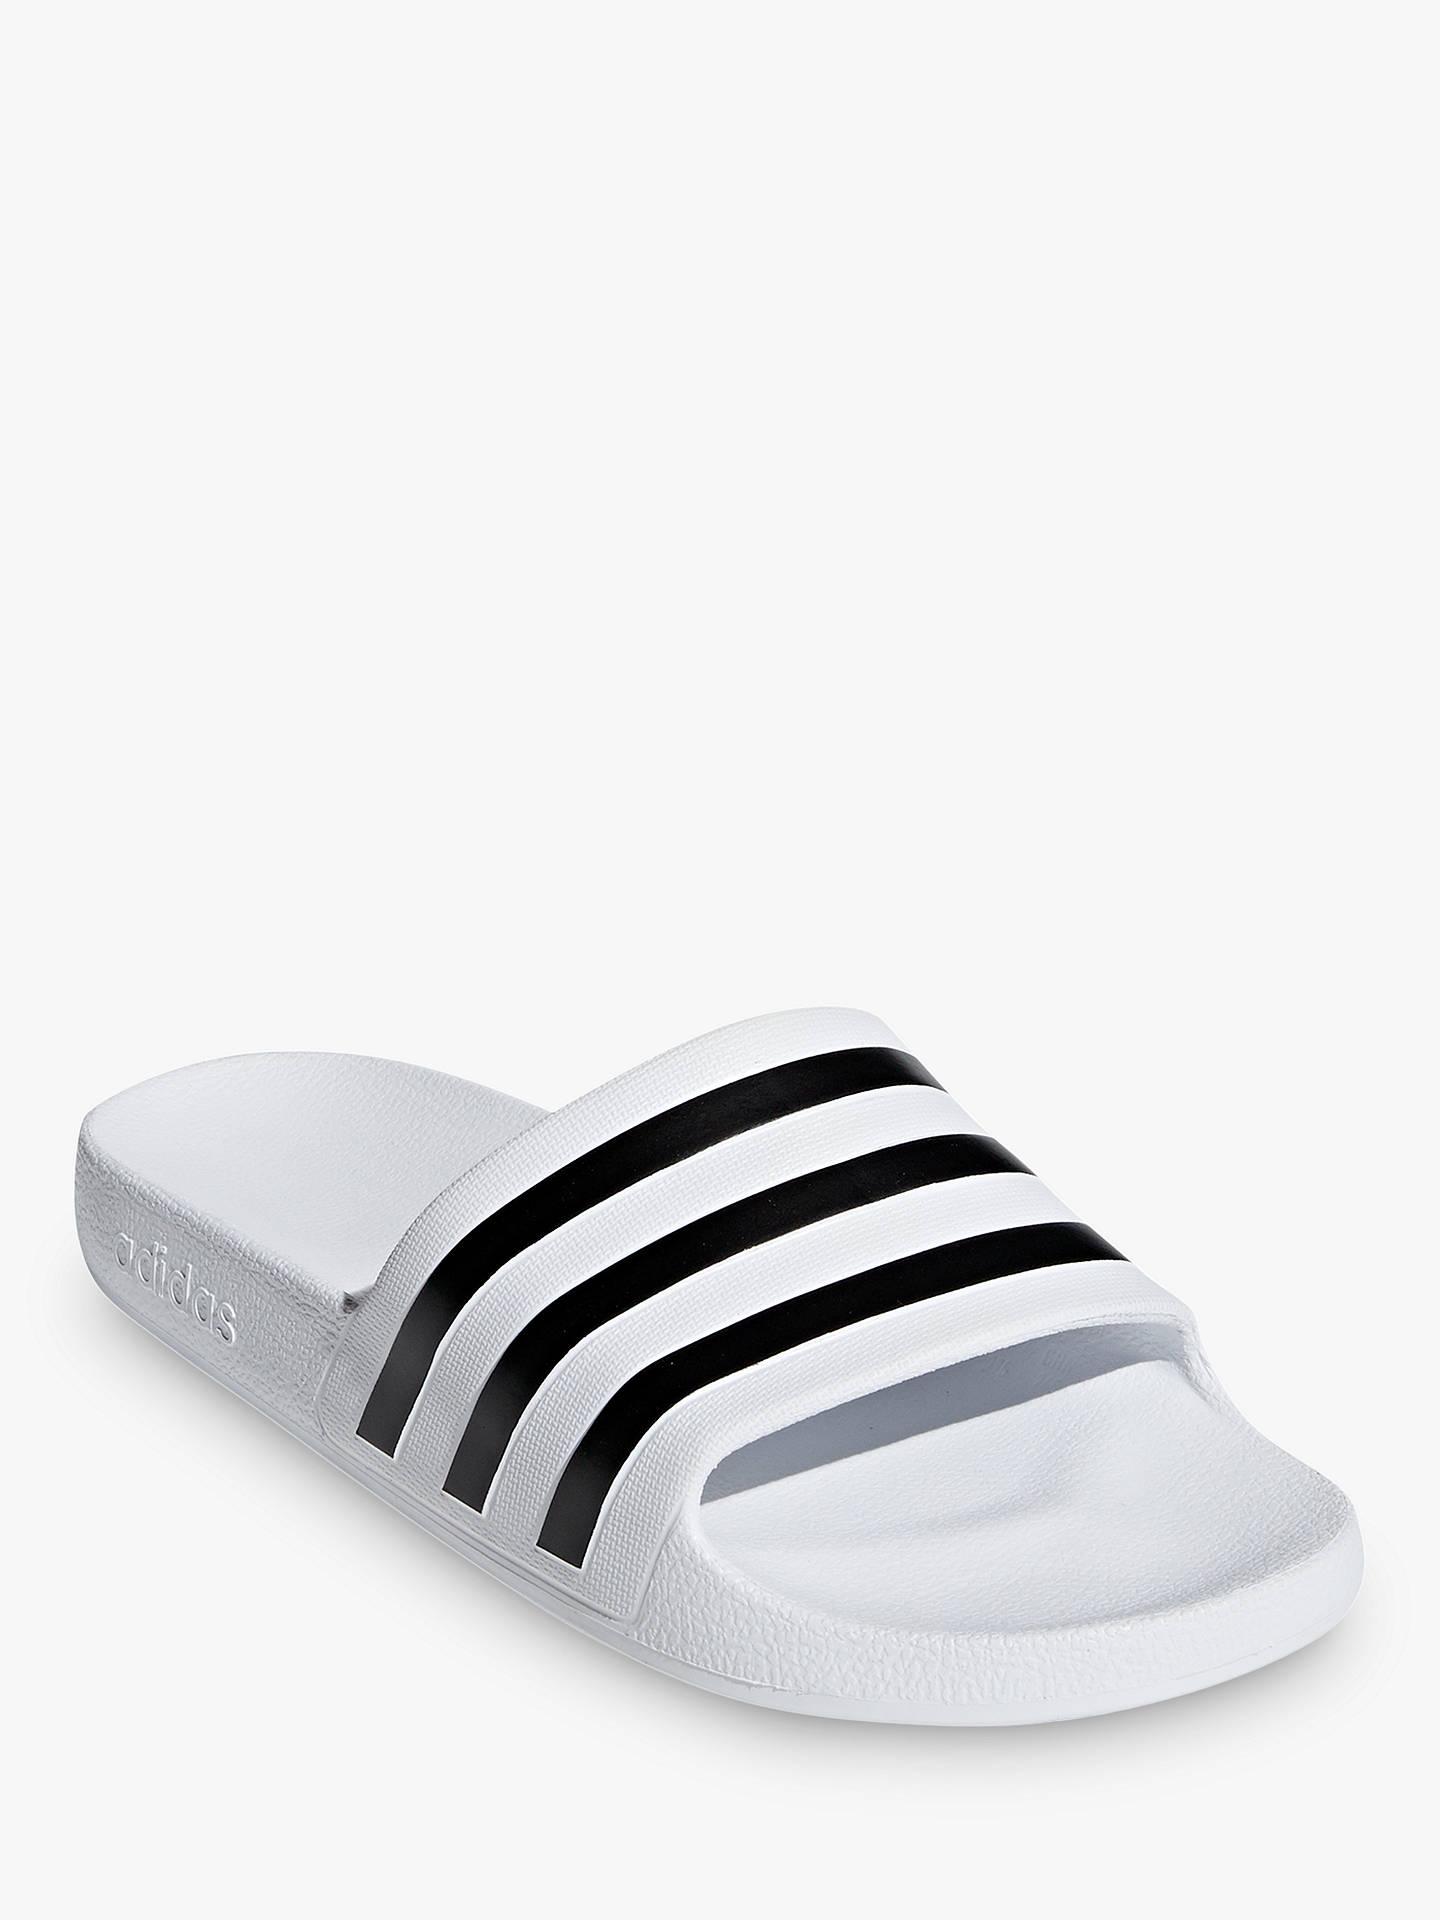 hot sale online bb2f6 22eca ... Buy adidas Adilette Aqua Women s Slides Slippers, White Black, 5 Online  at johnlewis ...